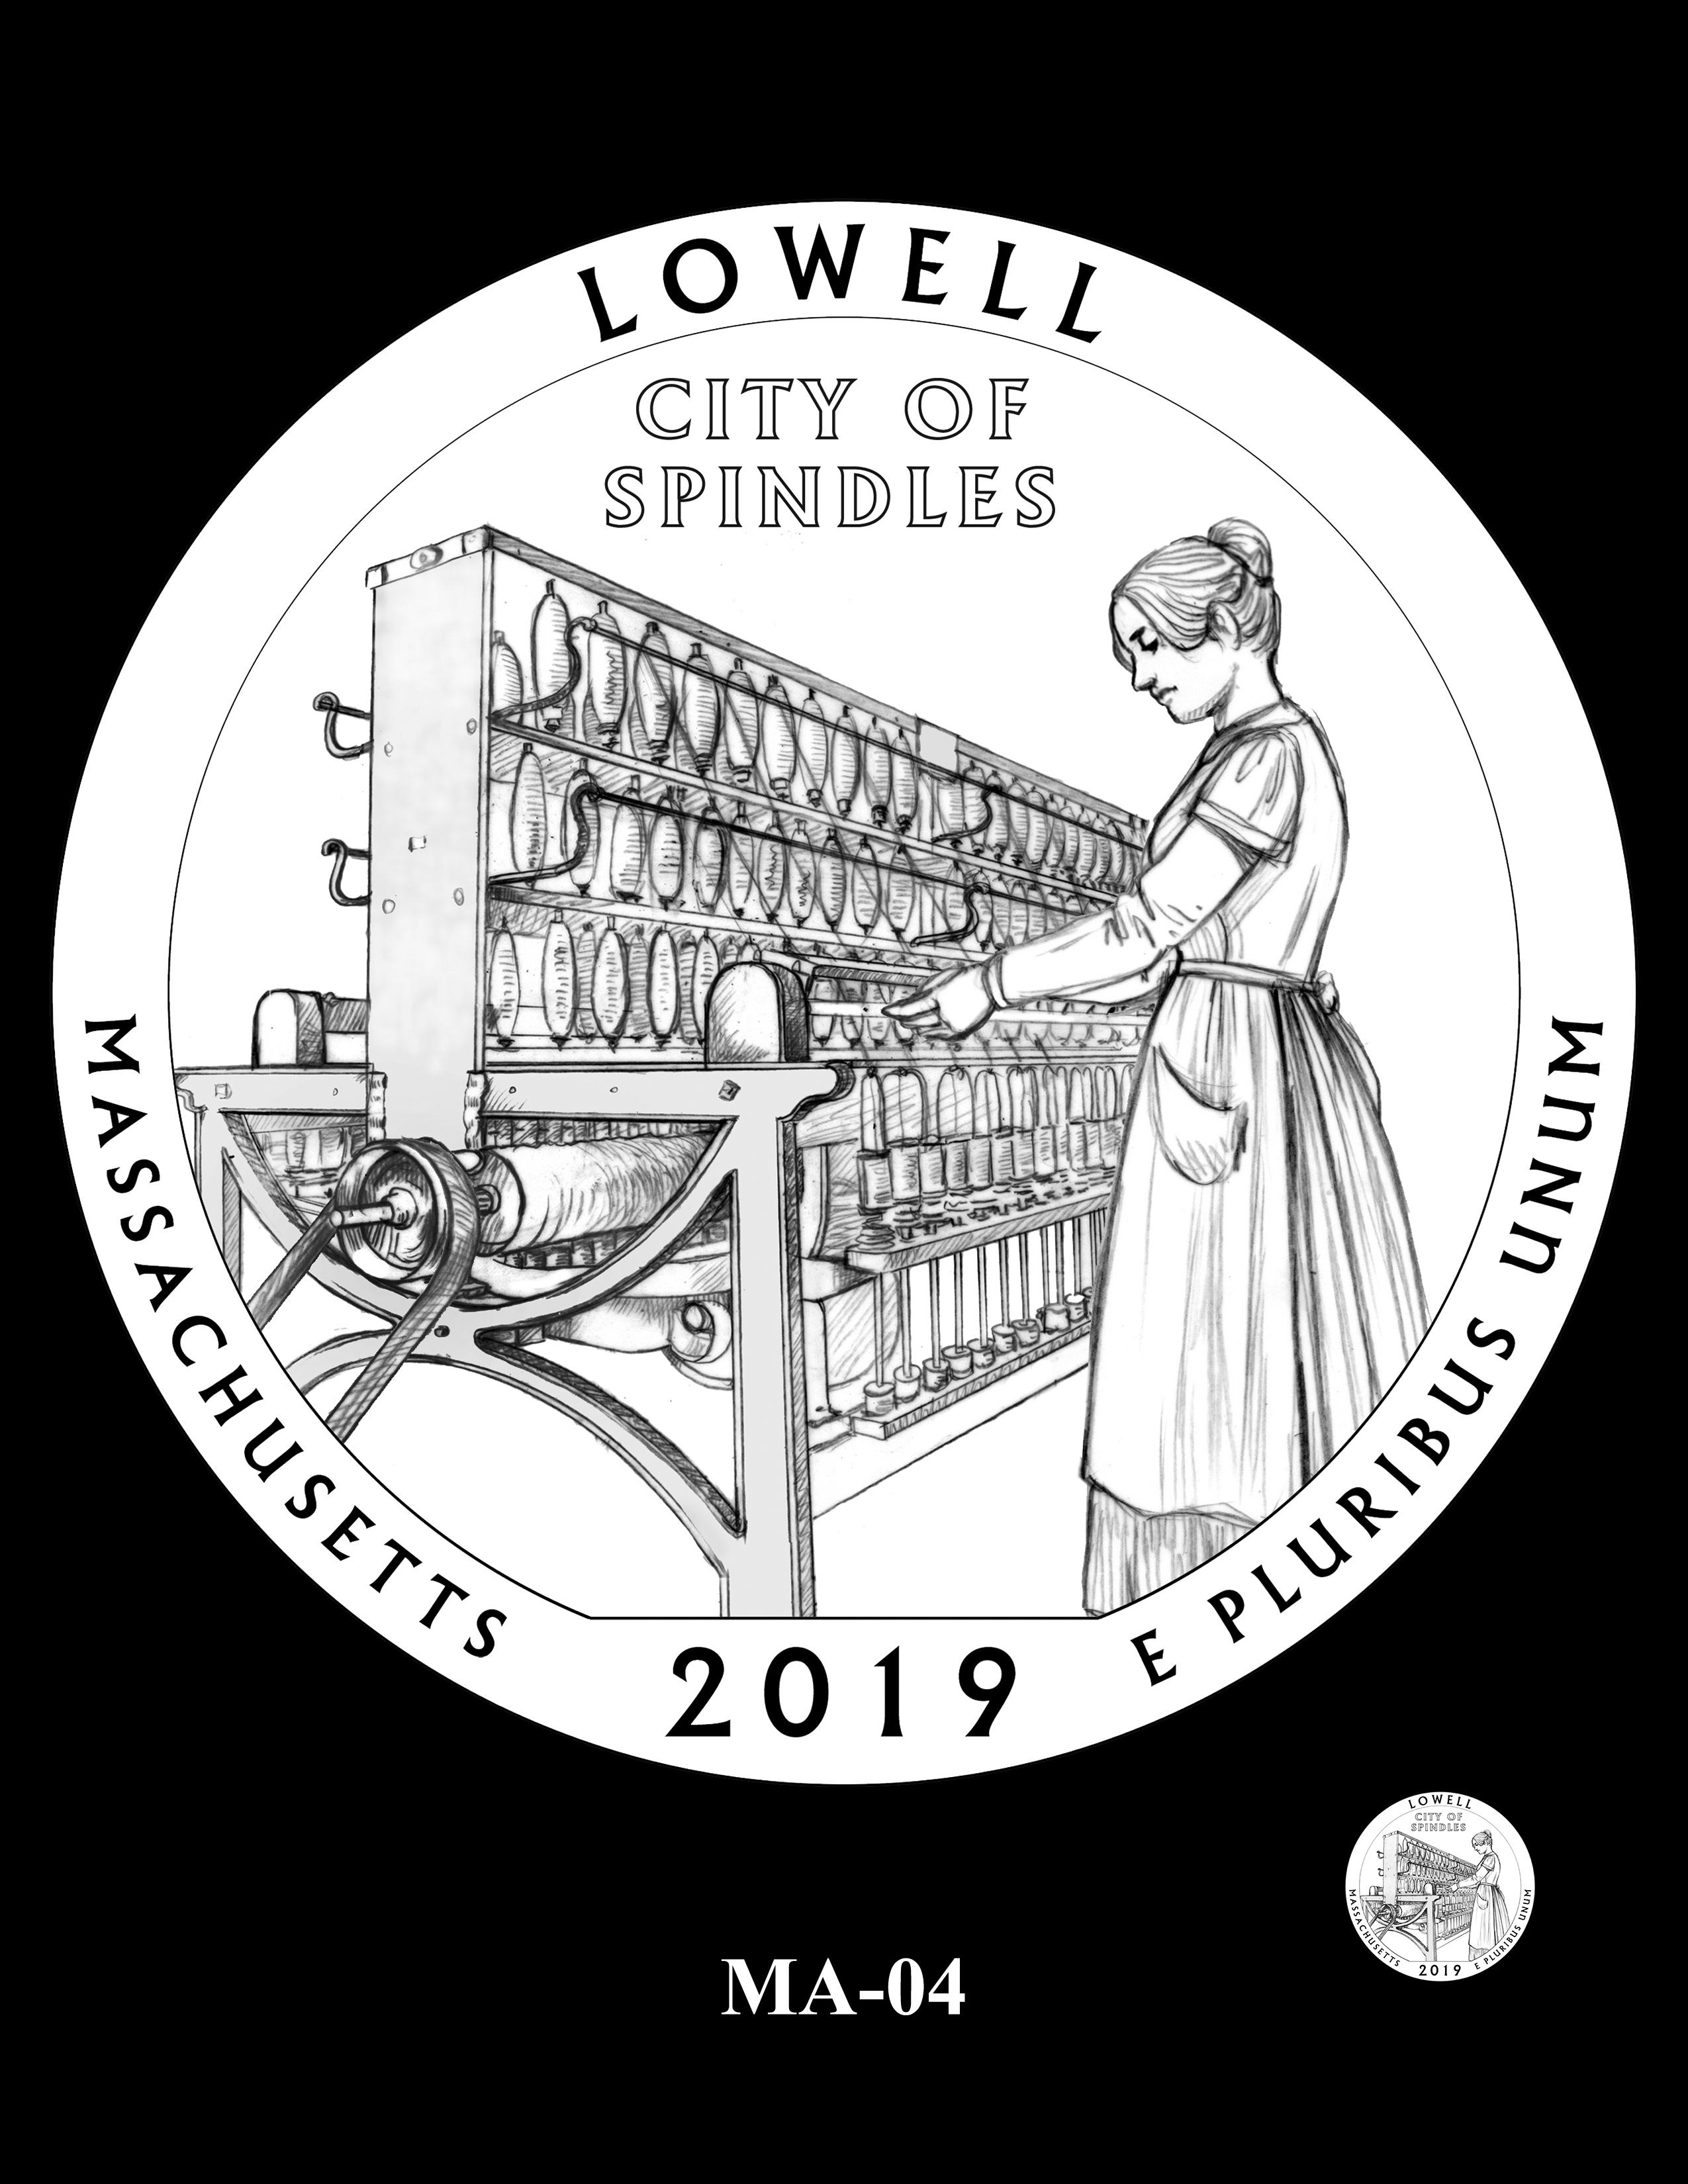 MA-04 -- 2019 America the Beautiful Quarters® Program